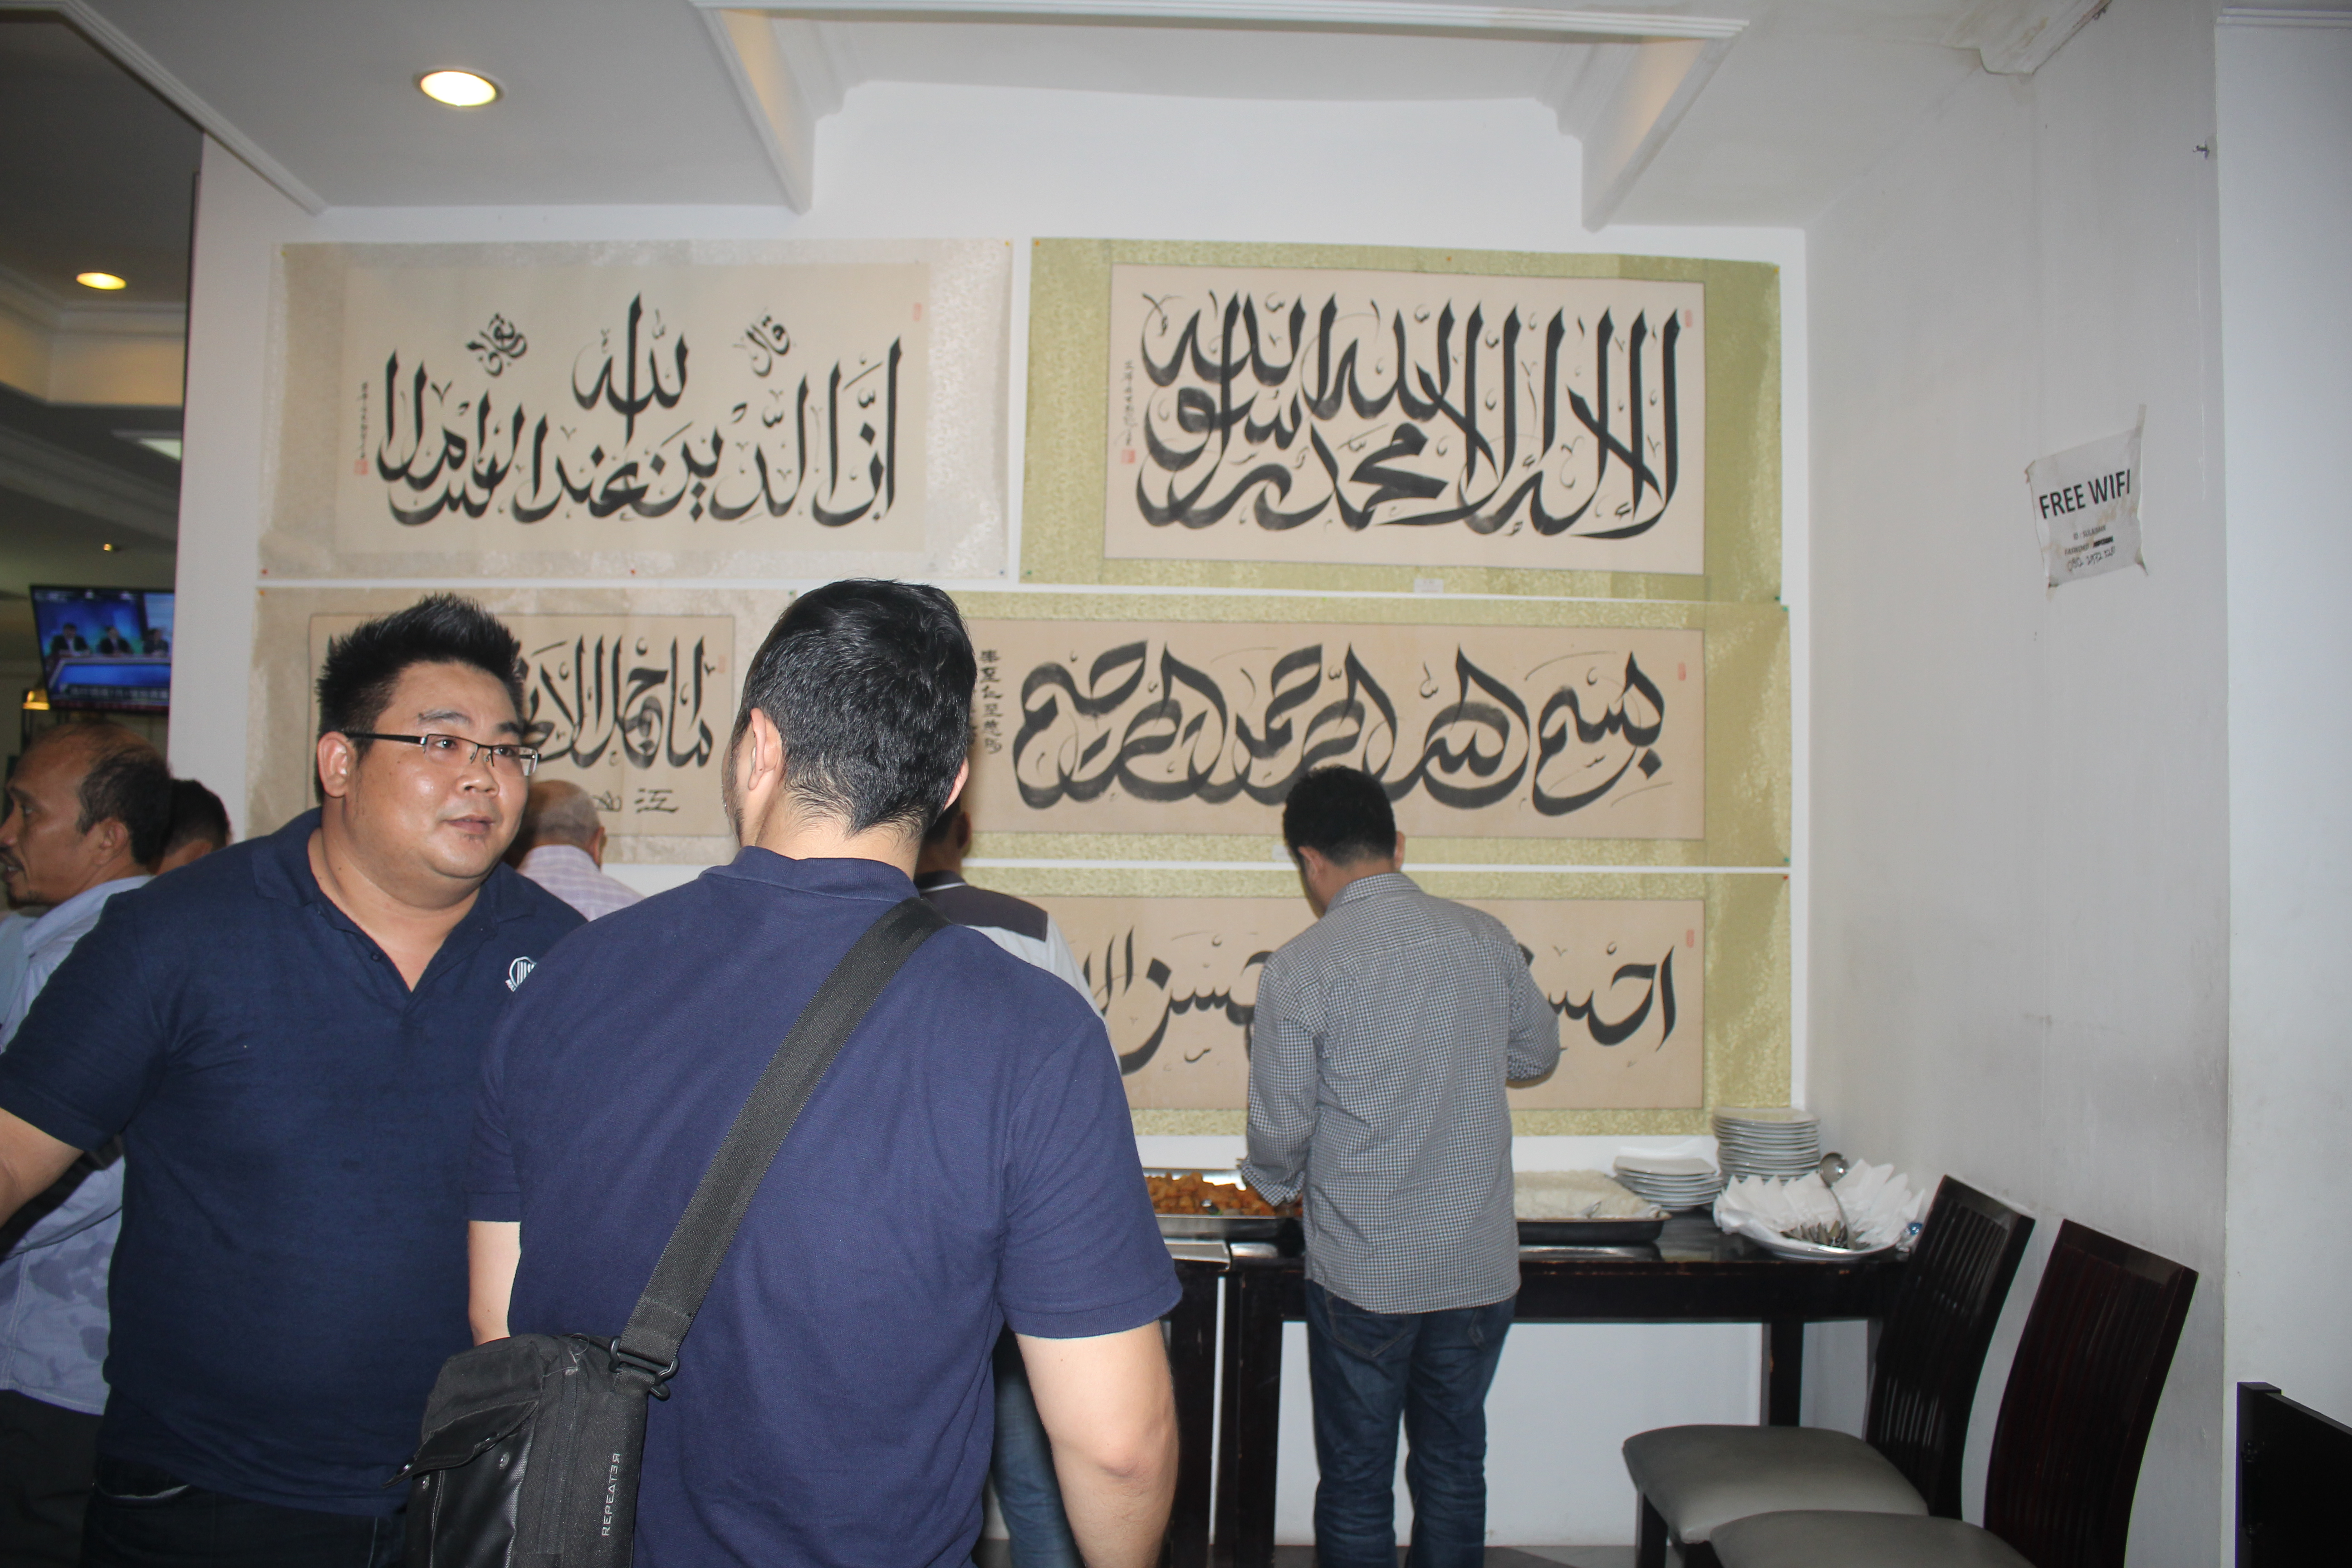 Sulaiman Resto Sajikan Kuliner Halal Khas Cina Muslim